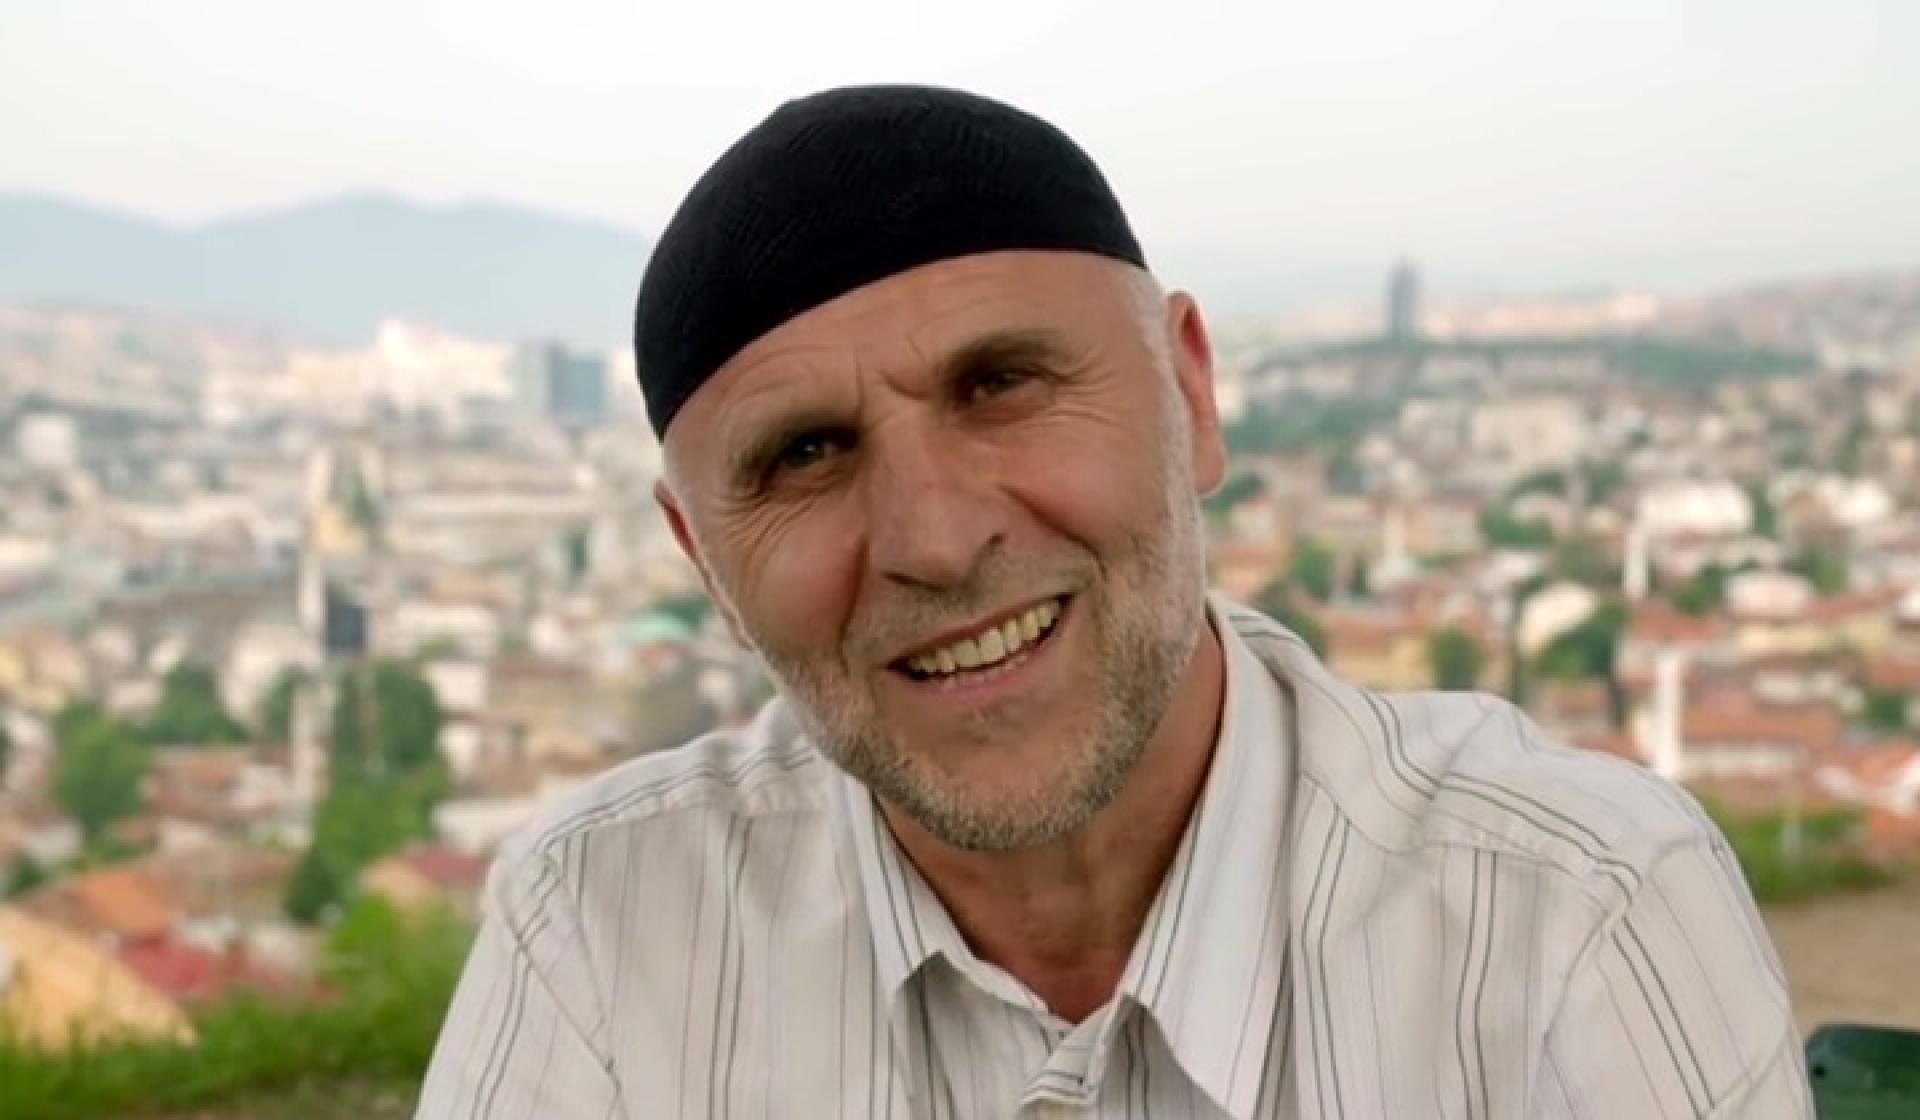 Bugari: Ko ne vlada sobom, voli da vlada drugima